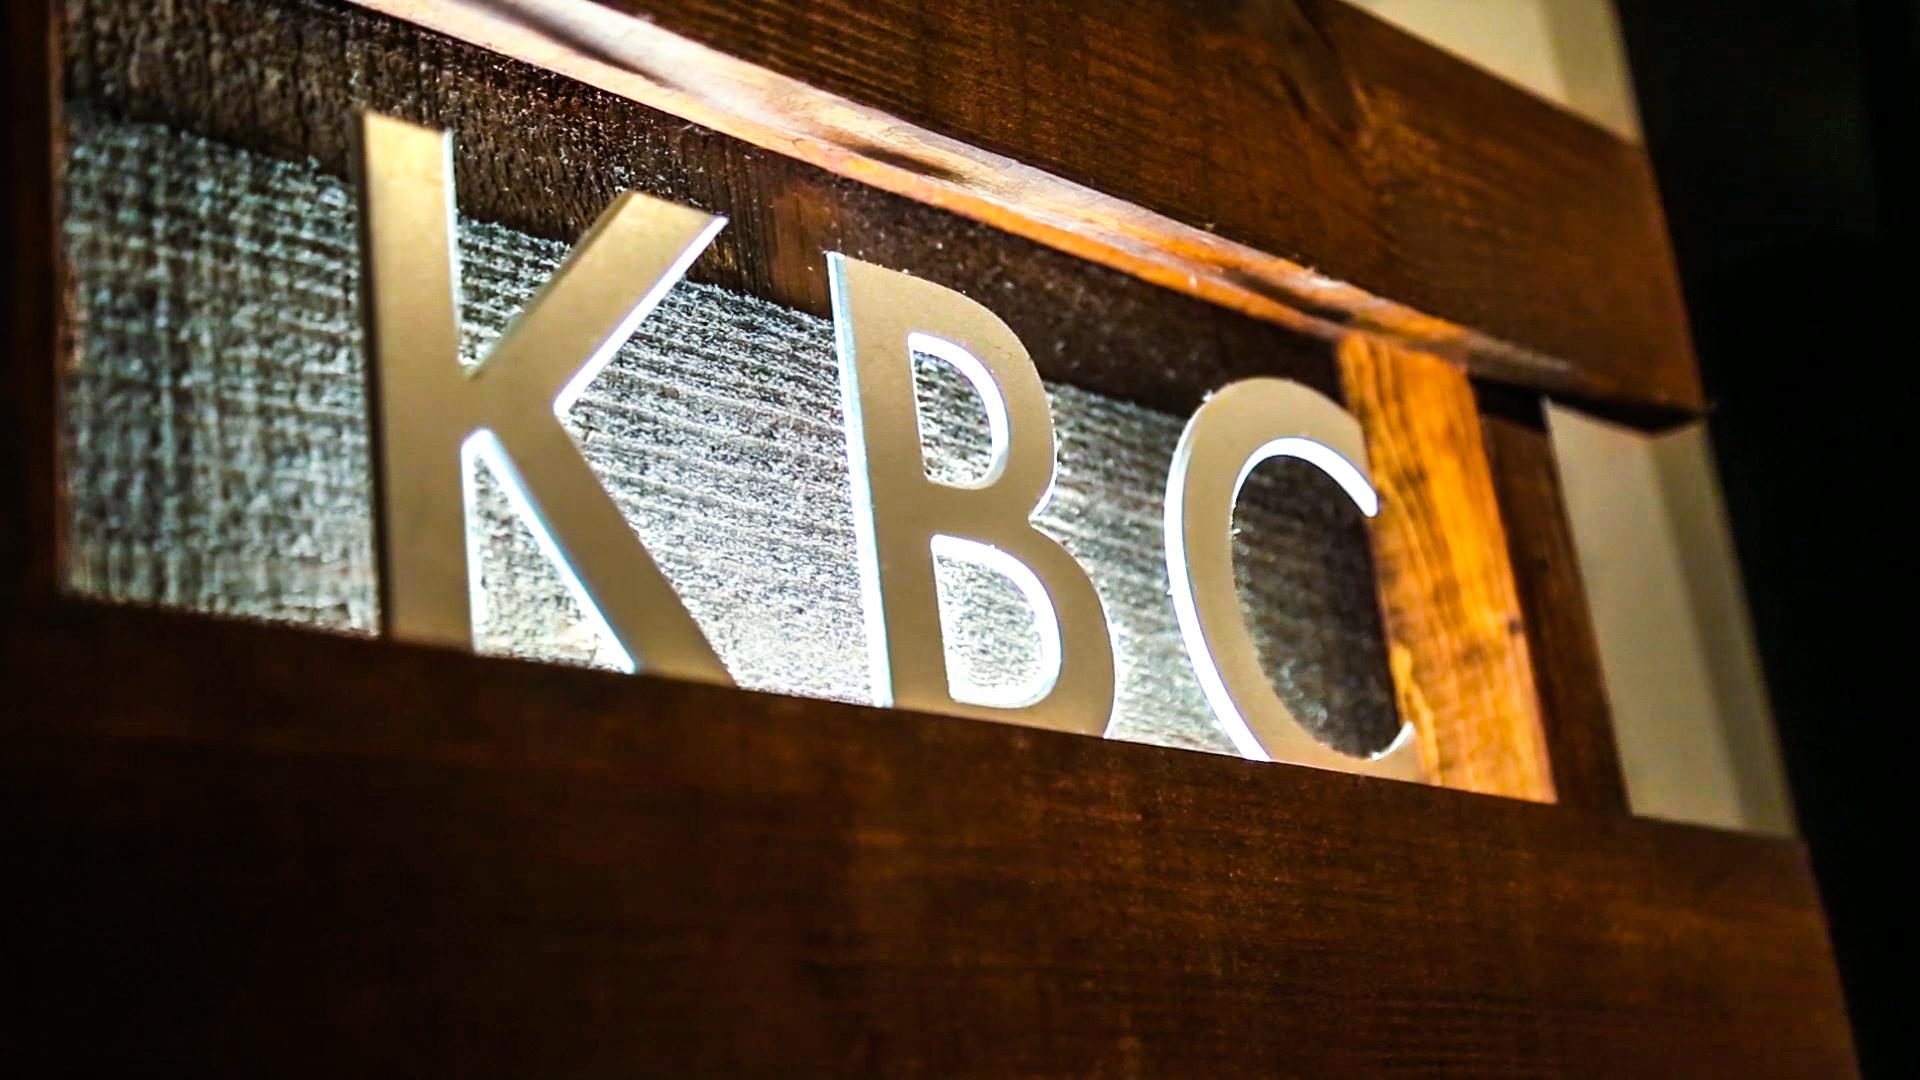 20170301-KBC sign.jpg